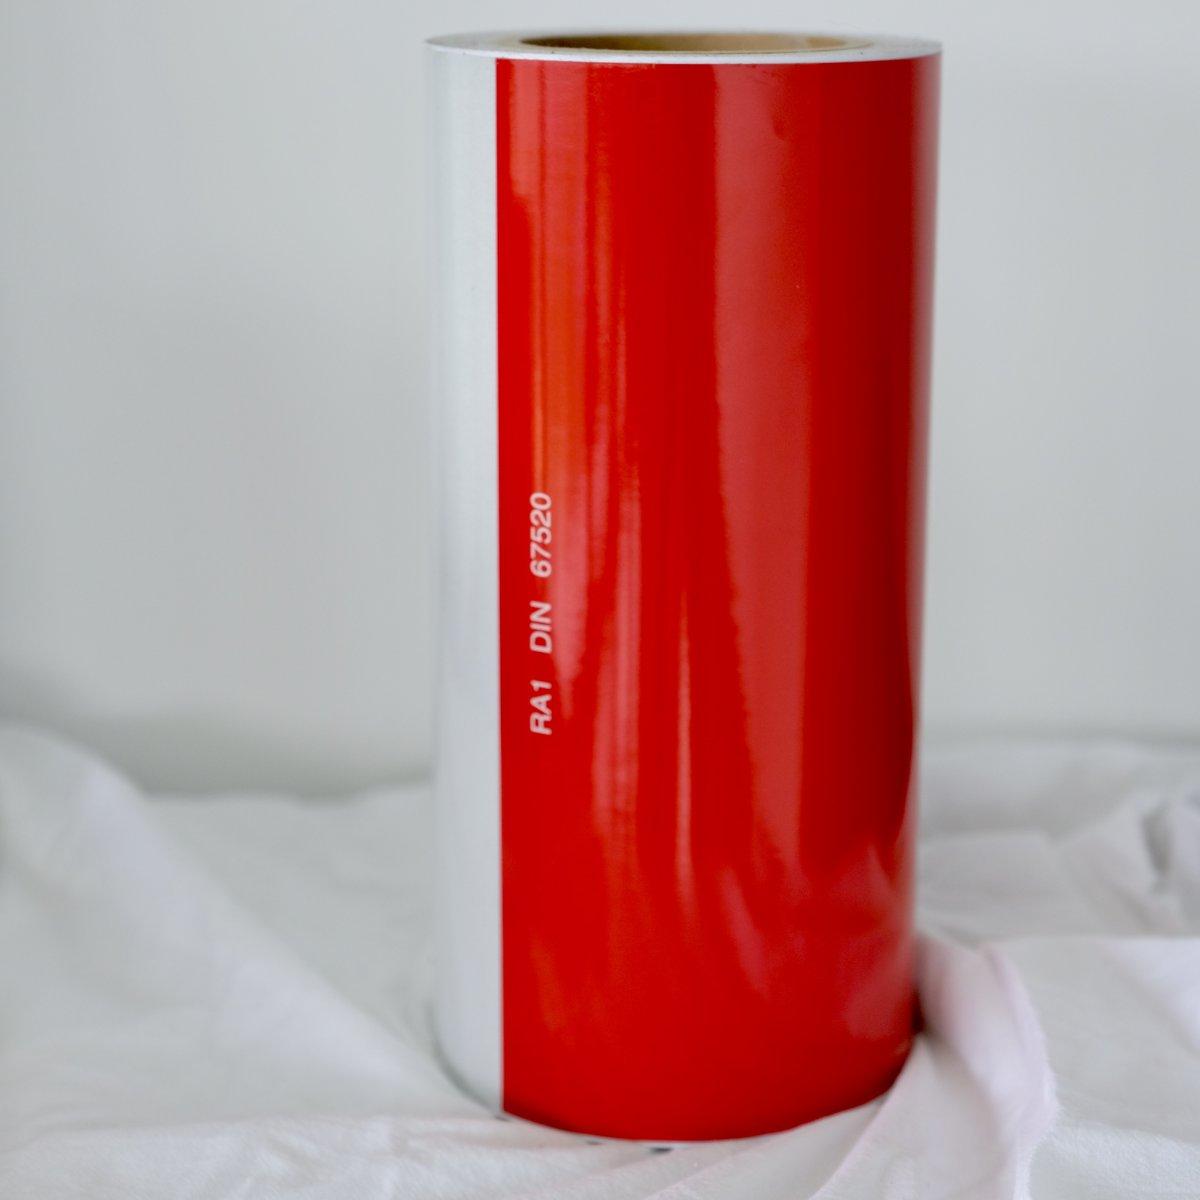 Prestriped Engineer Grade Reflective Barricade Tape